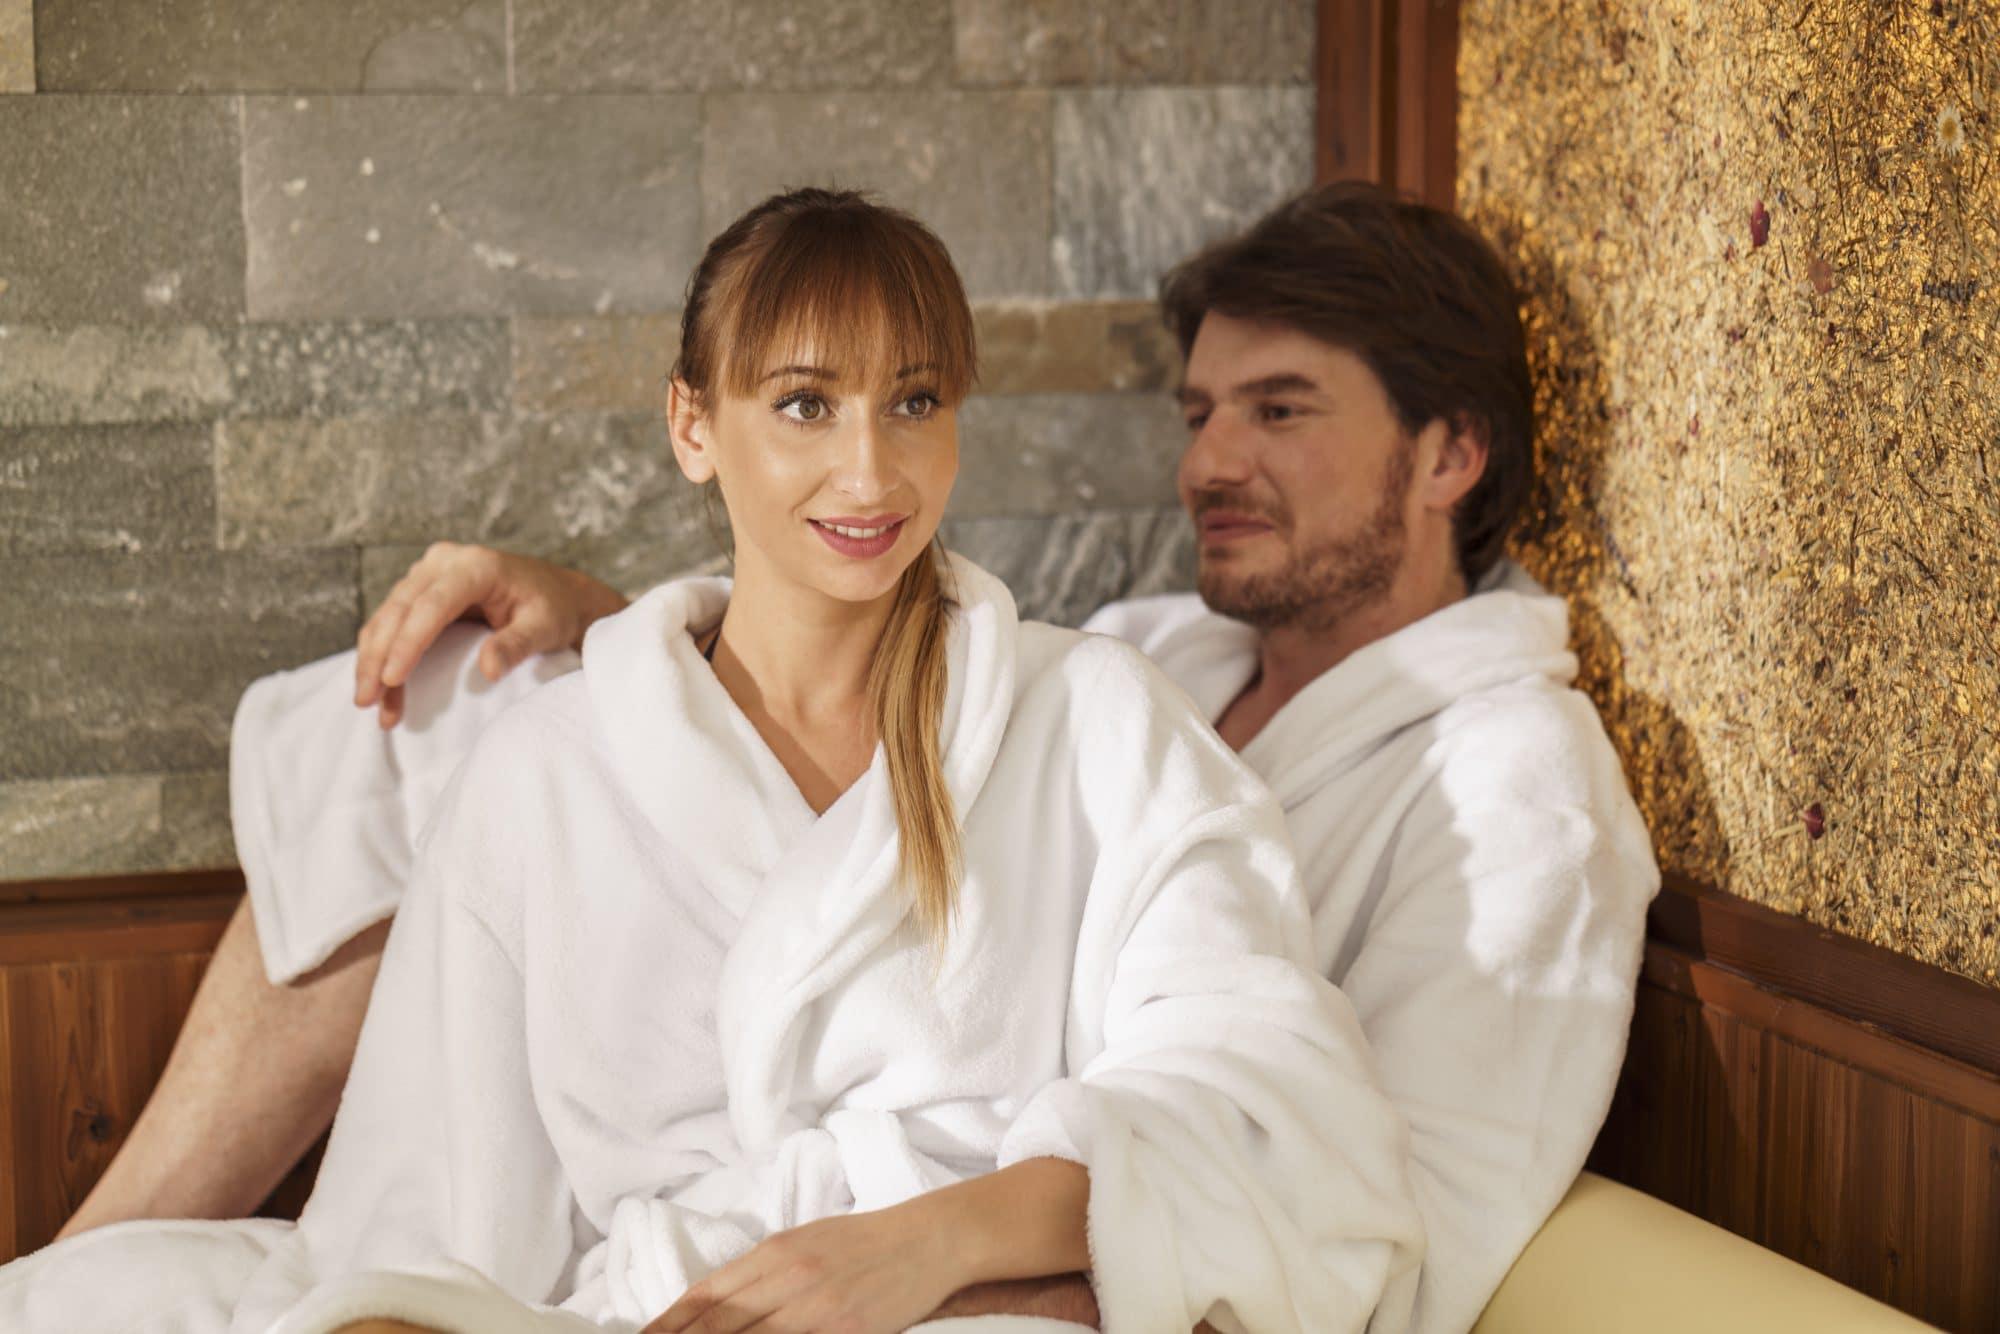 Dating agentur zams, Grafenwrth partnersuche 50 plus